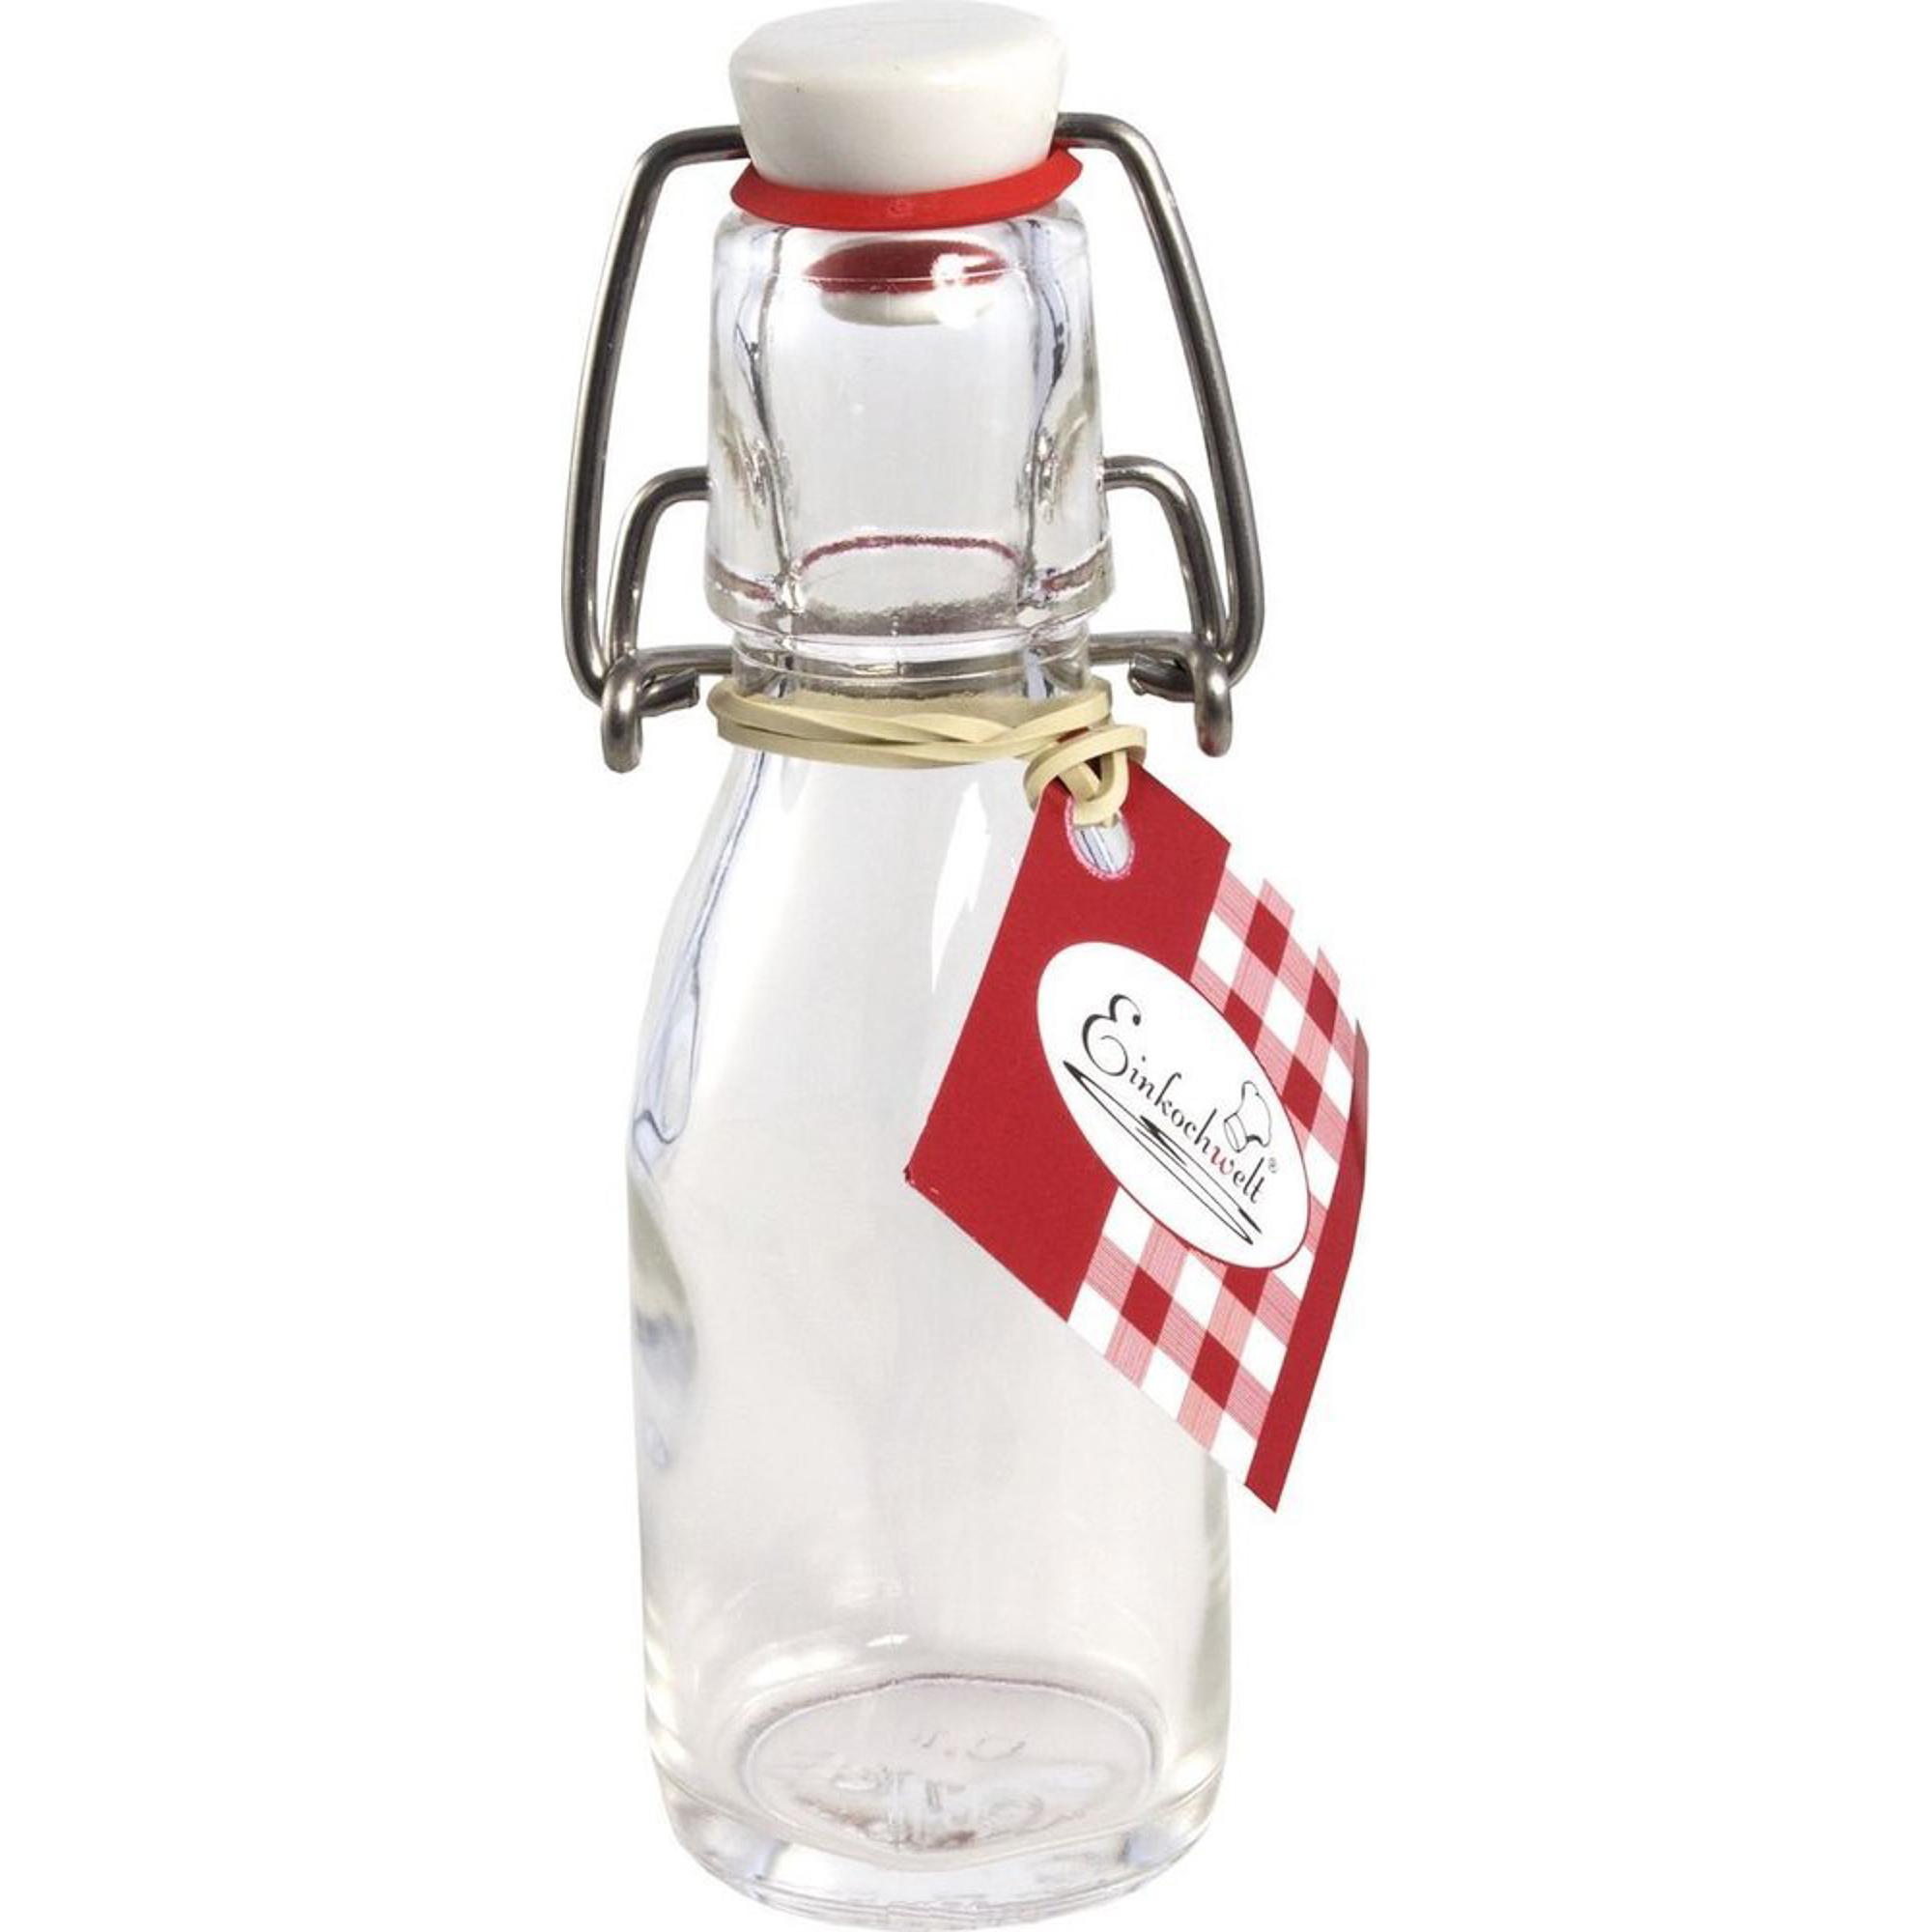 Бутылка 100мл с пробкой Einkochwelt 346401 фото